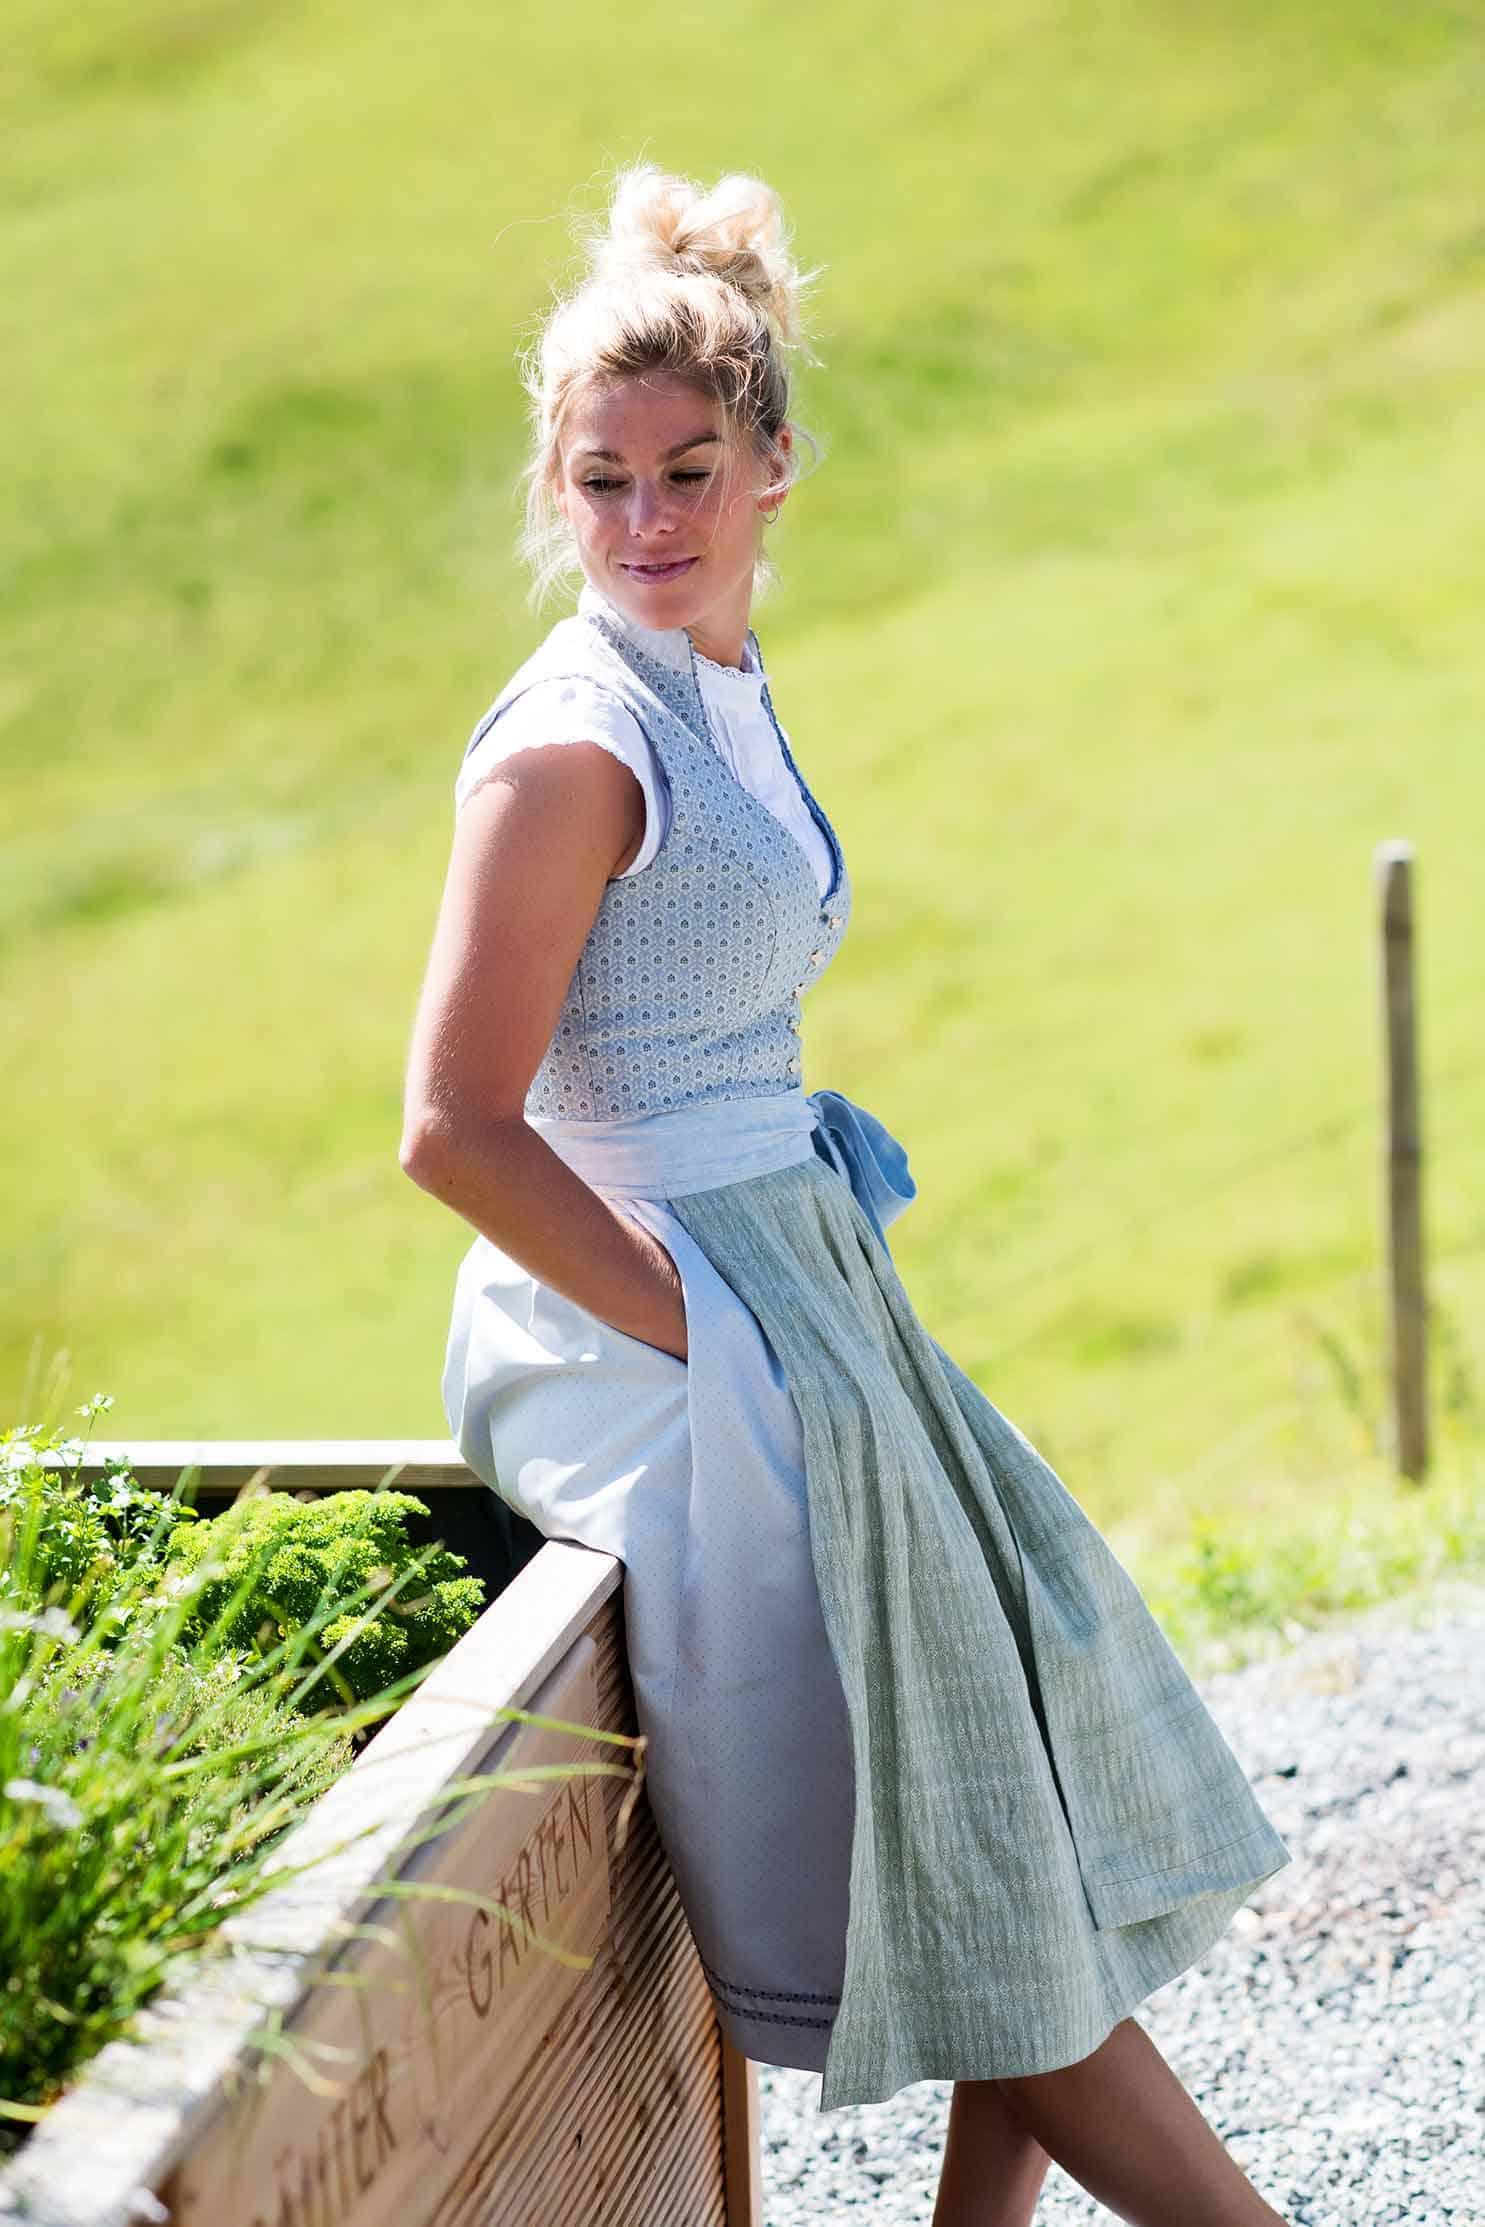 Belli im Dirndl Mathilda Sonnbühel in Kitzbühel Kooperationspartner AlpenHerz